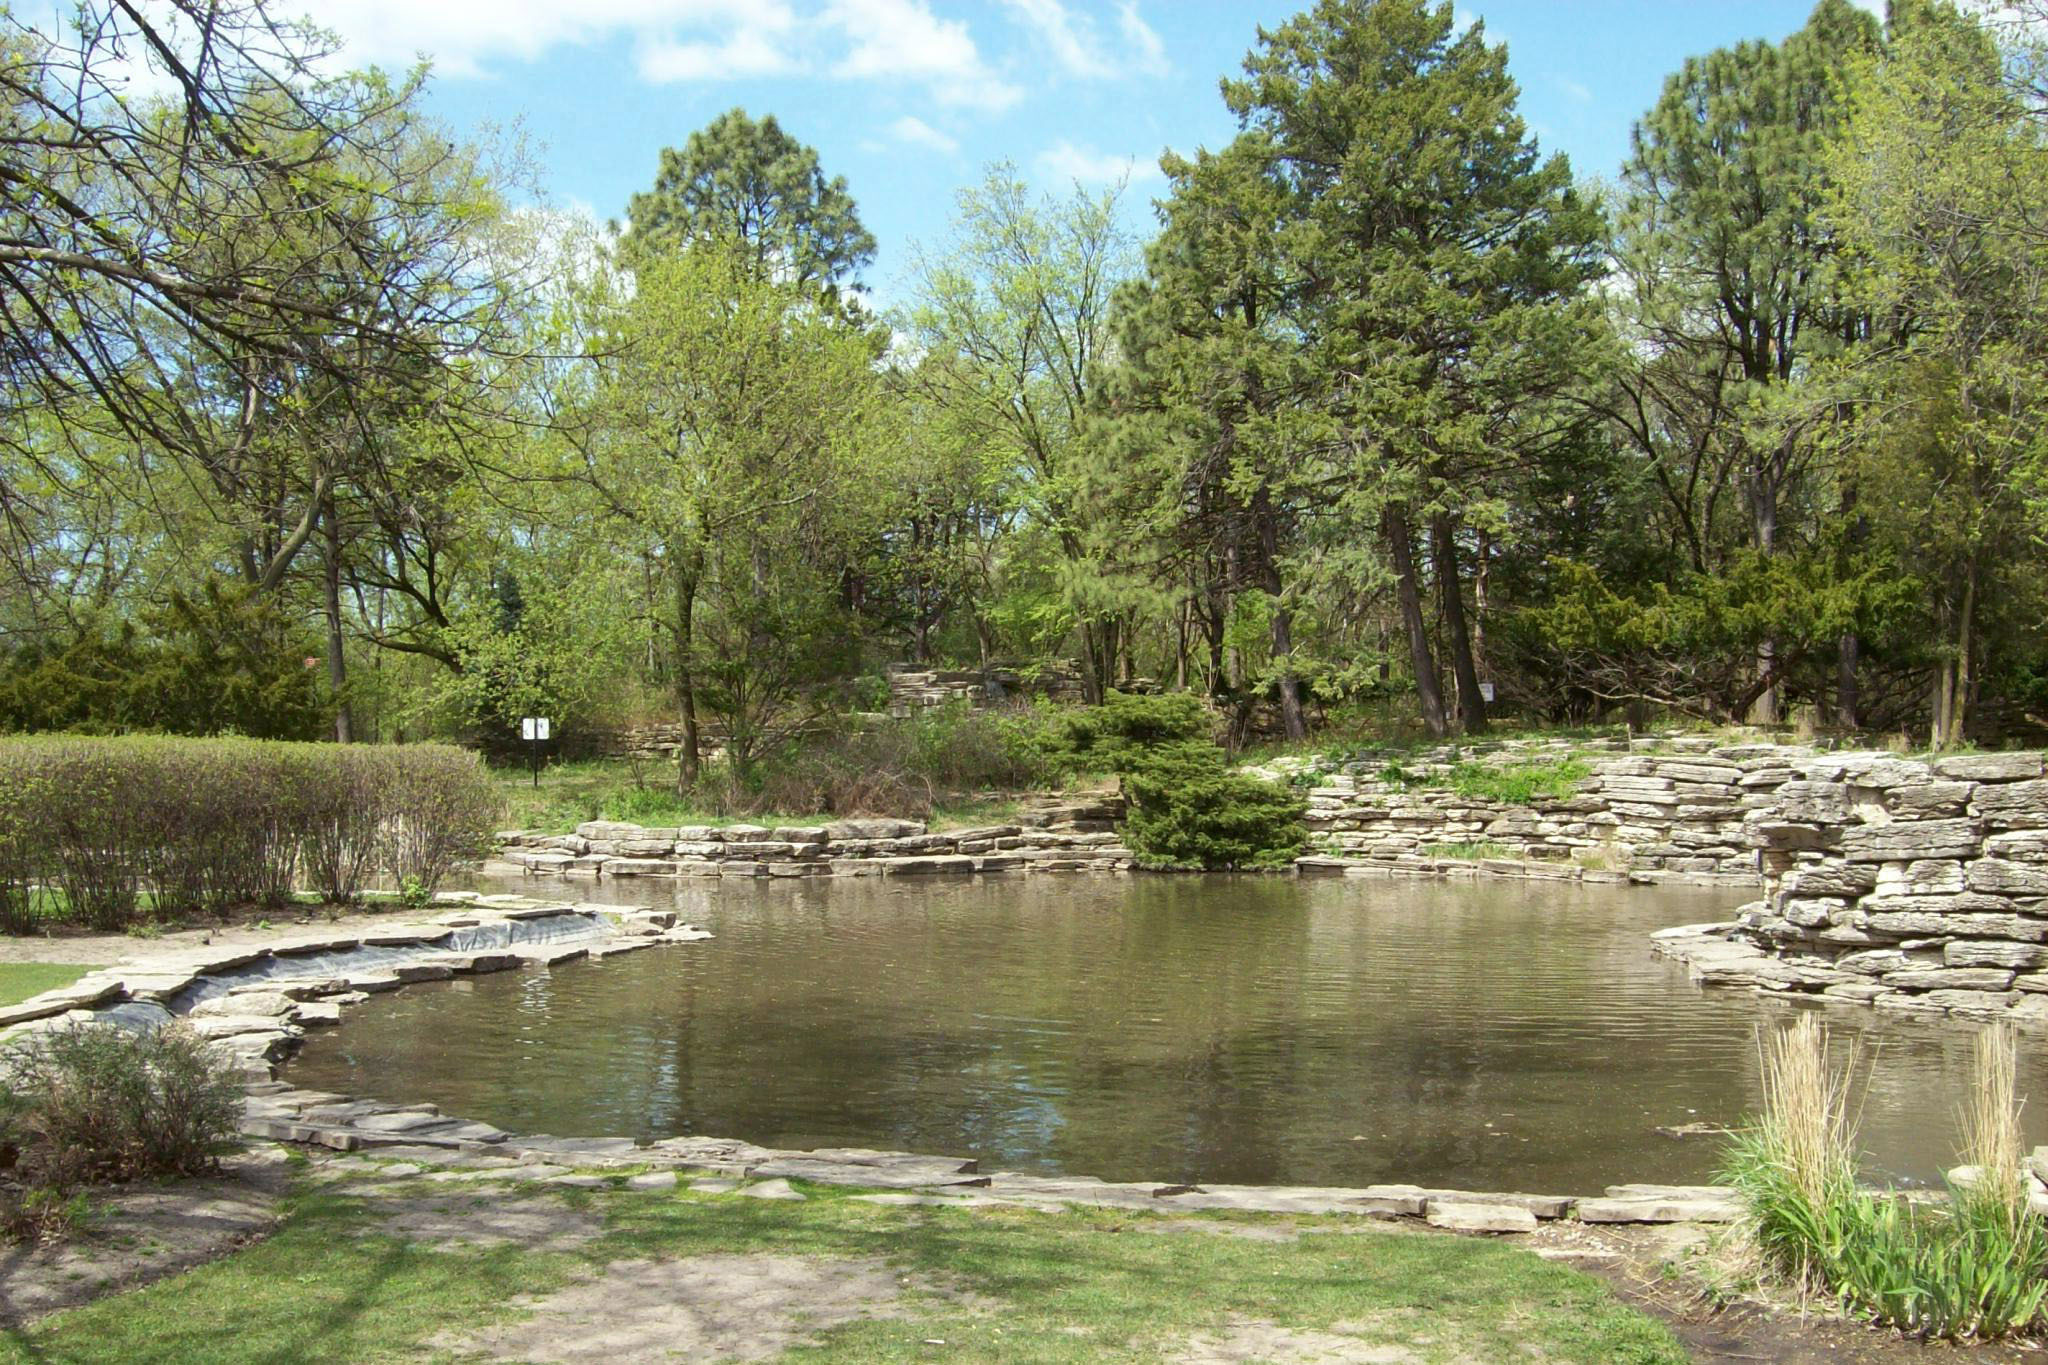 Visit the North Park Village Nature Center